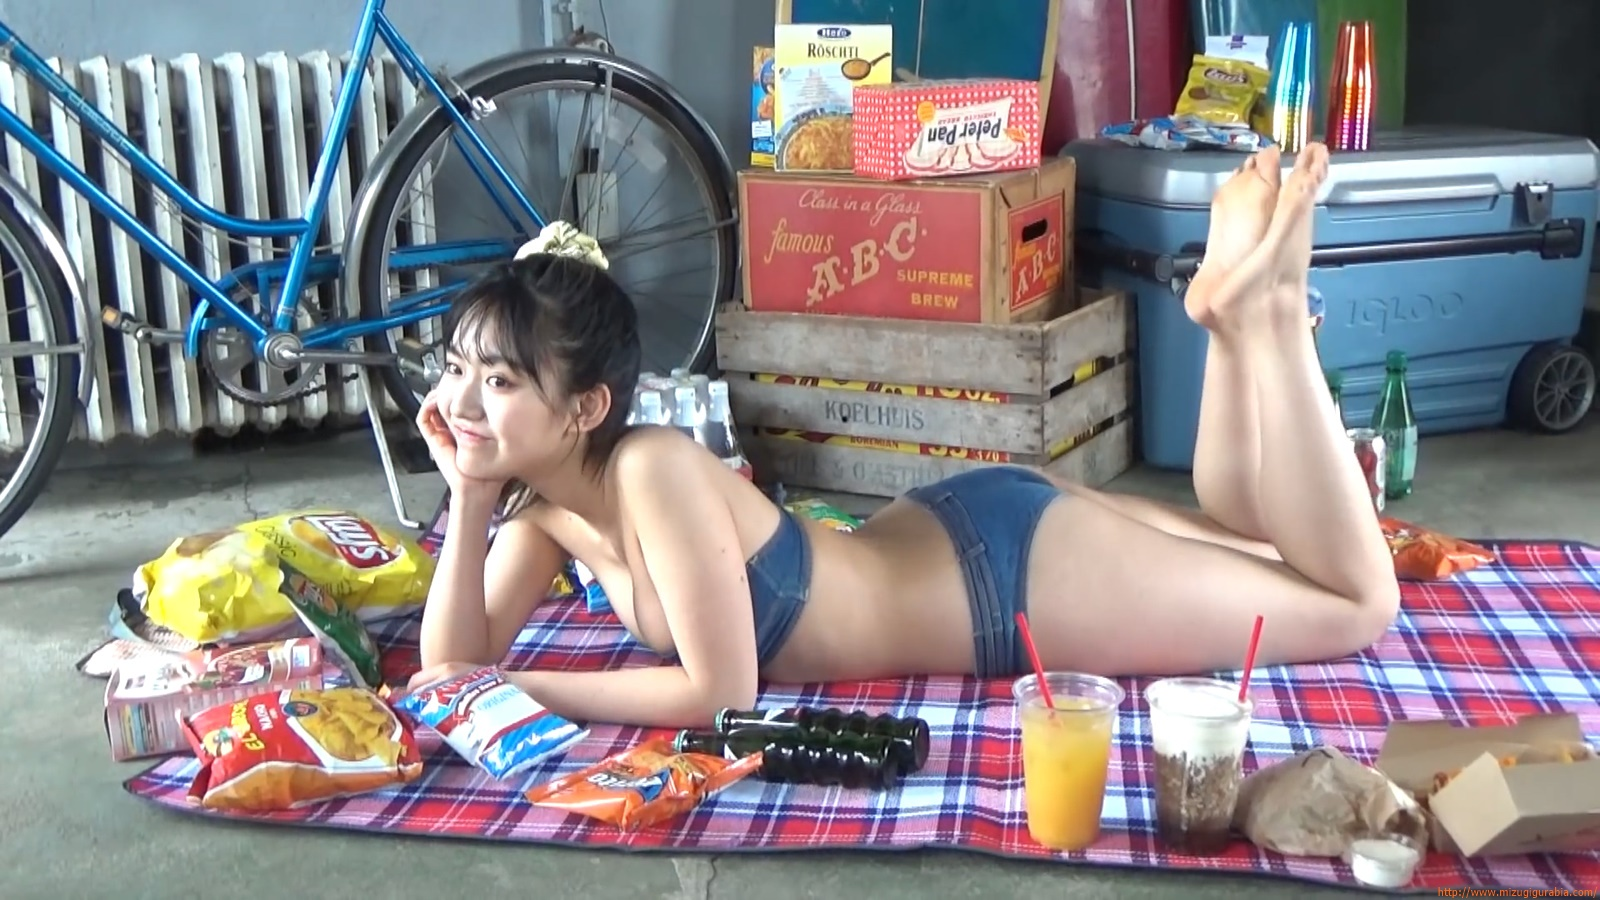 Lunar Toyota high school student Runas brain trip swimsuit gravure089